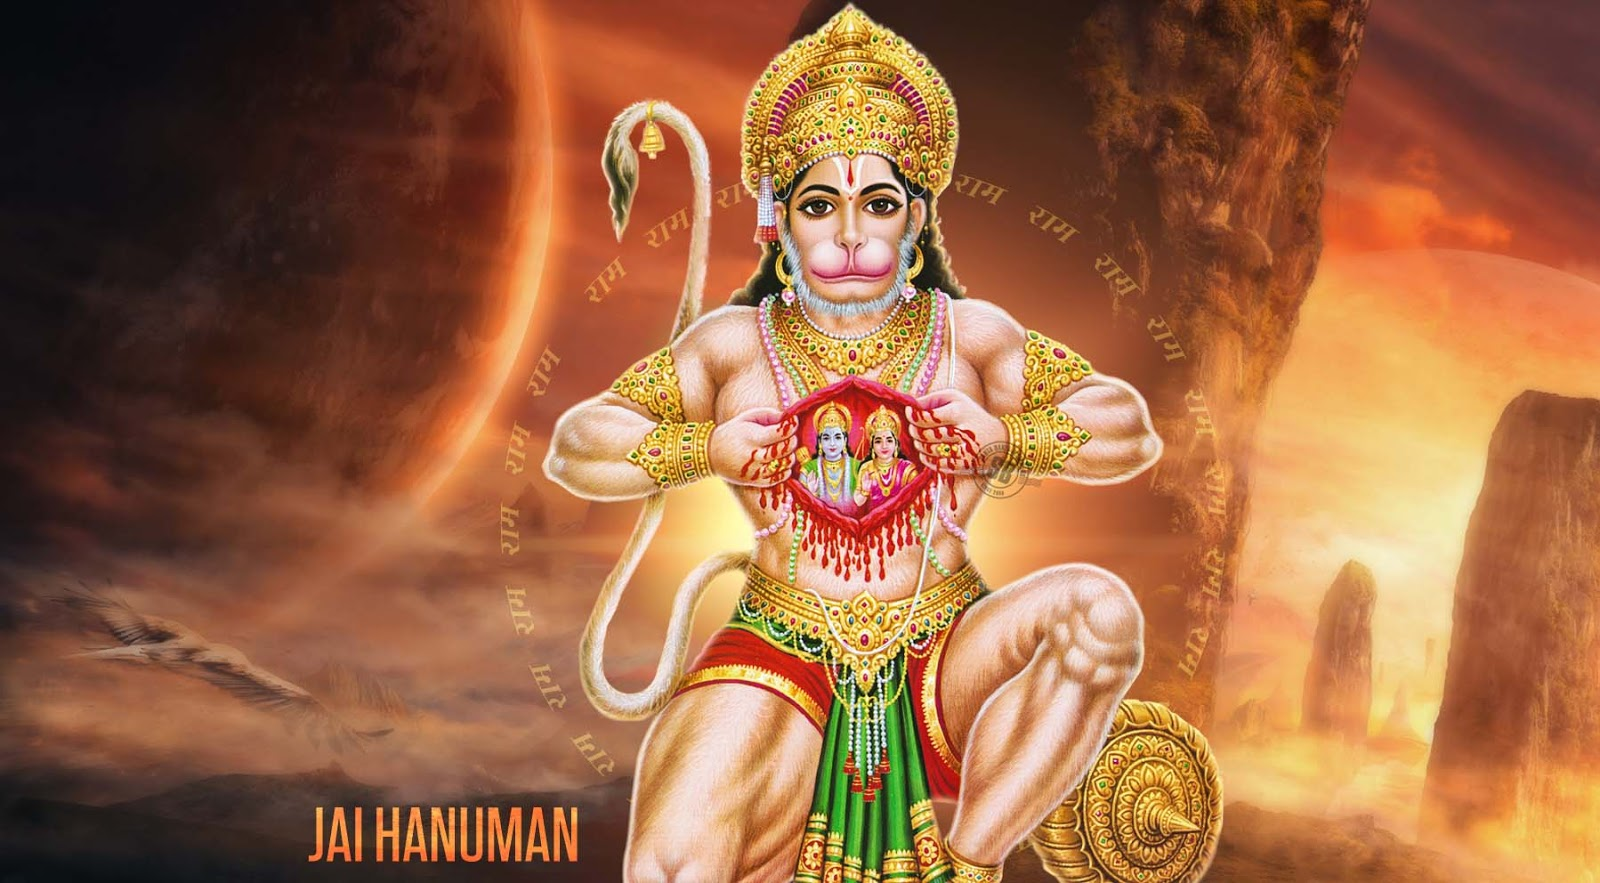 Hd wallpaper of hanuman - Hanuman Wallpaperrs